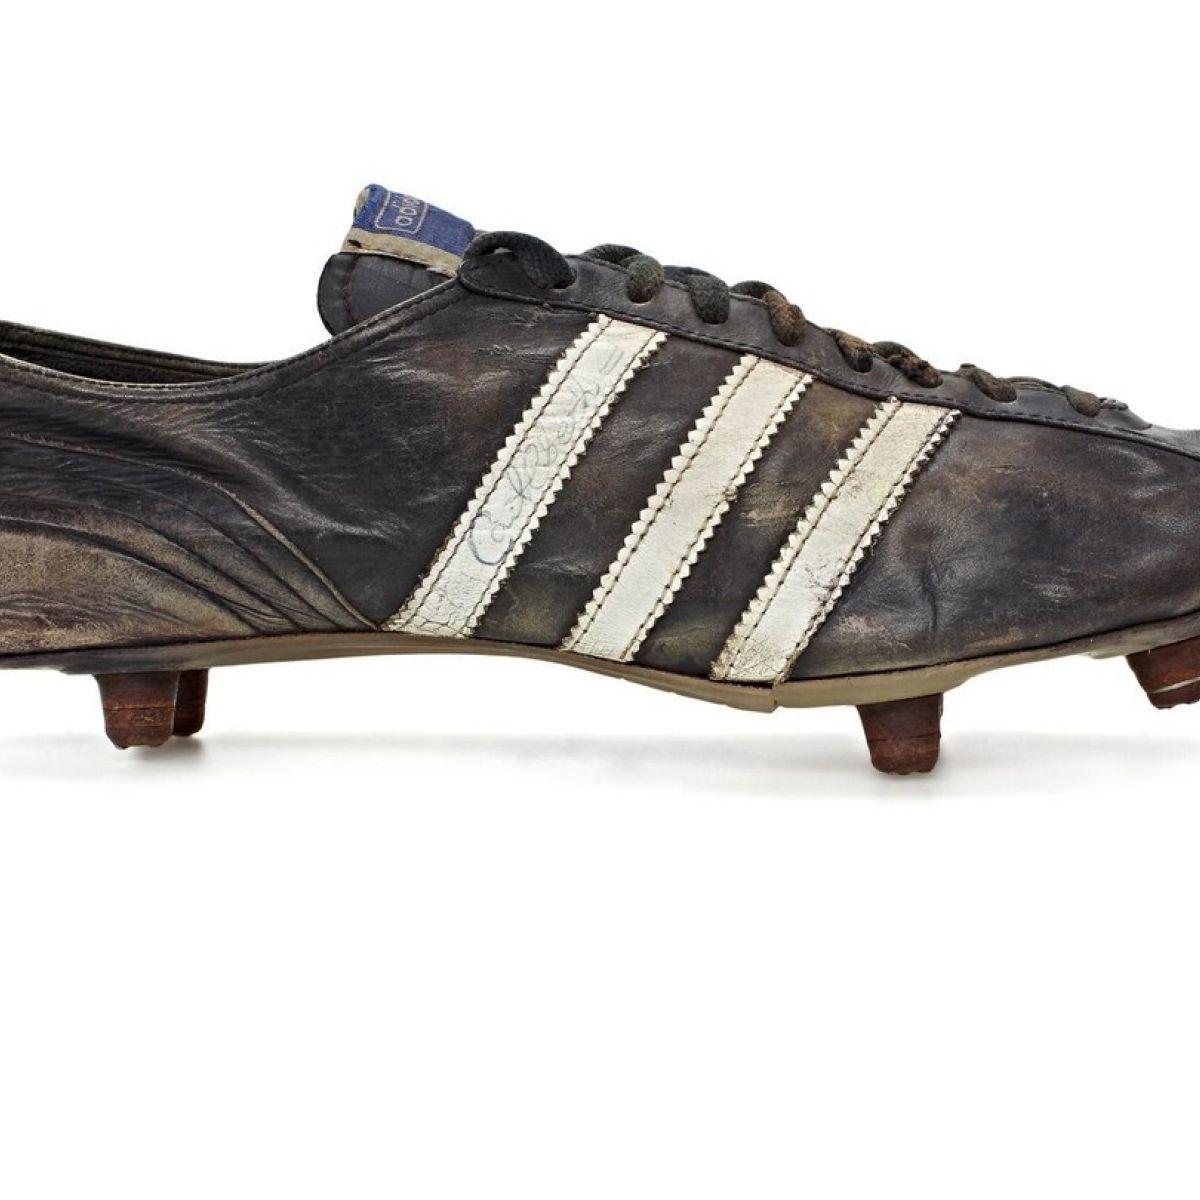 Design Moment: Adidas football boot, 1953